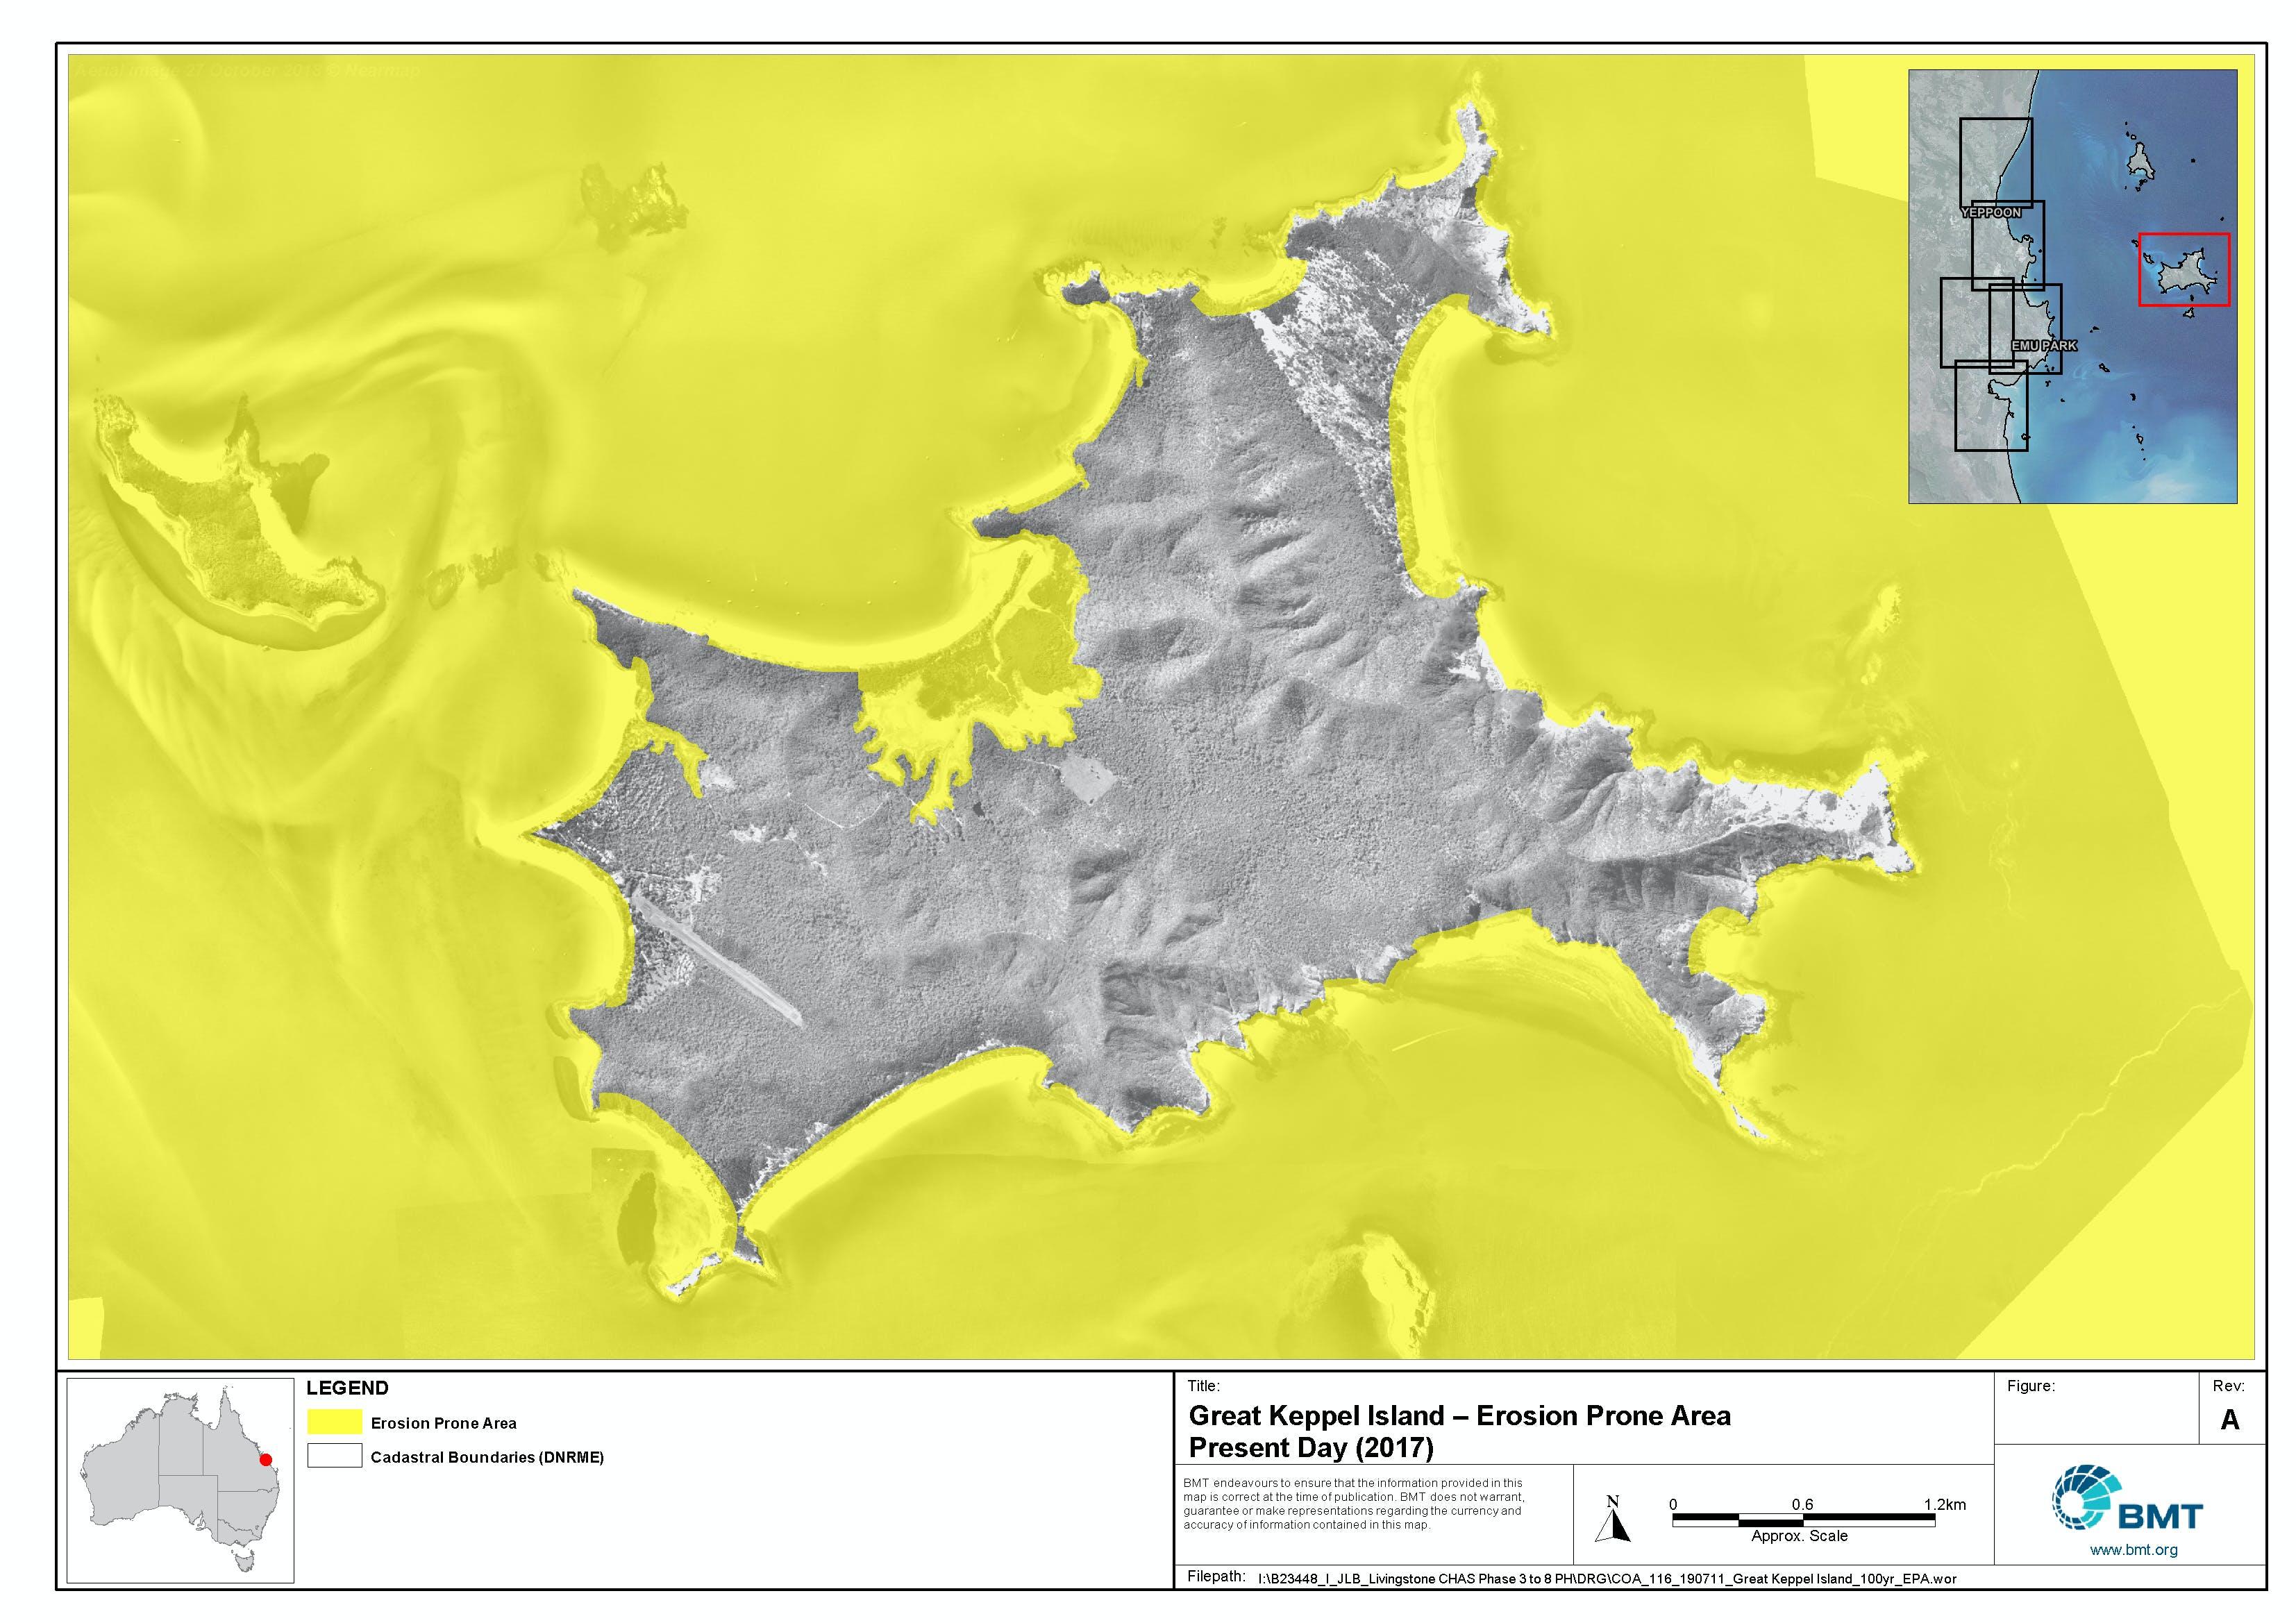 COA_116_190711_Great Keppel Island_100yr_EPA.jpg